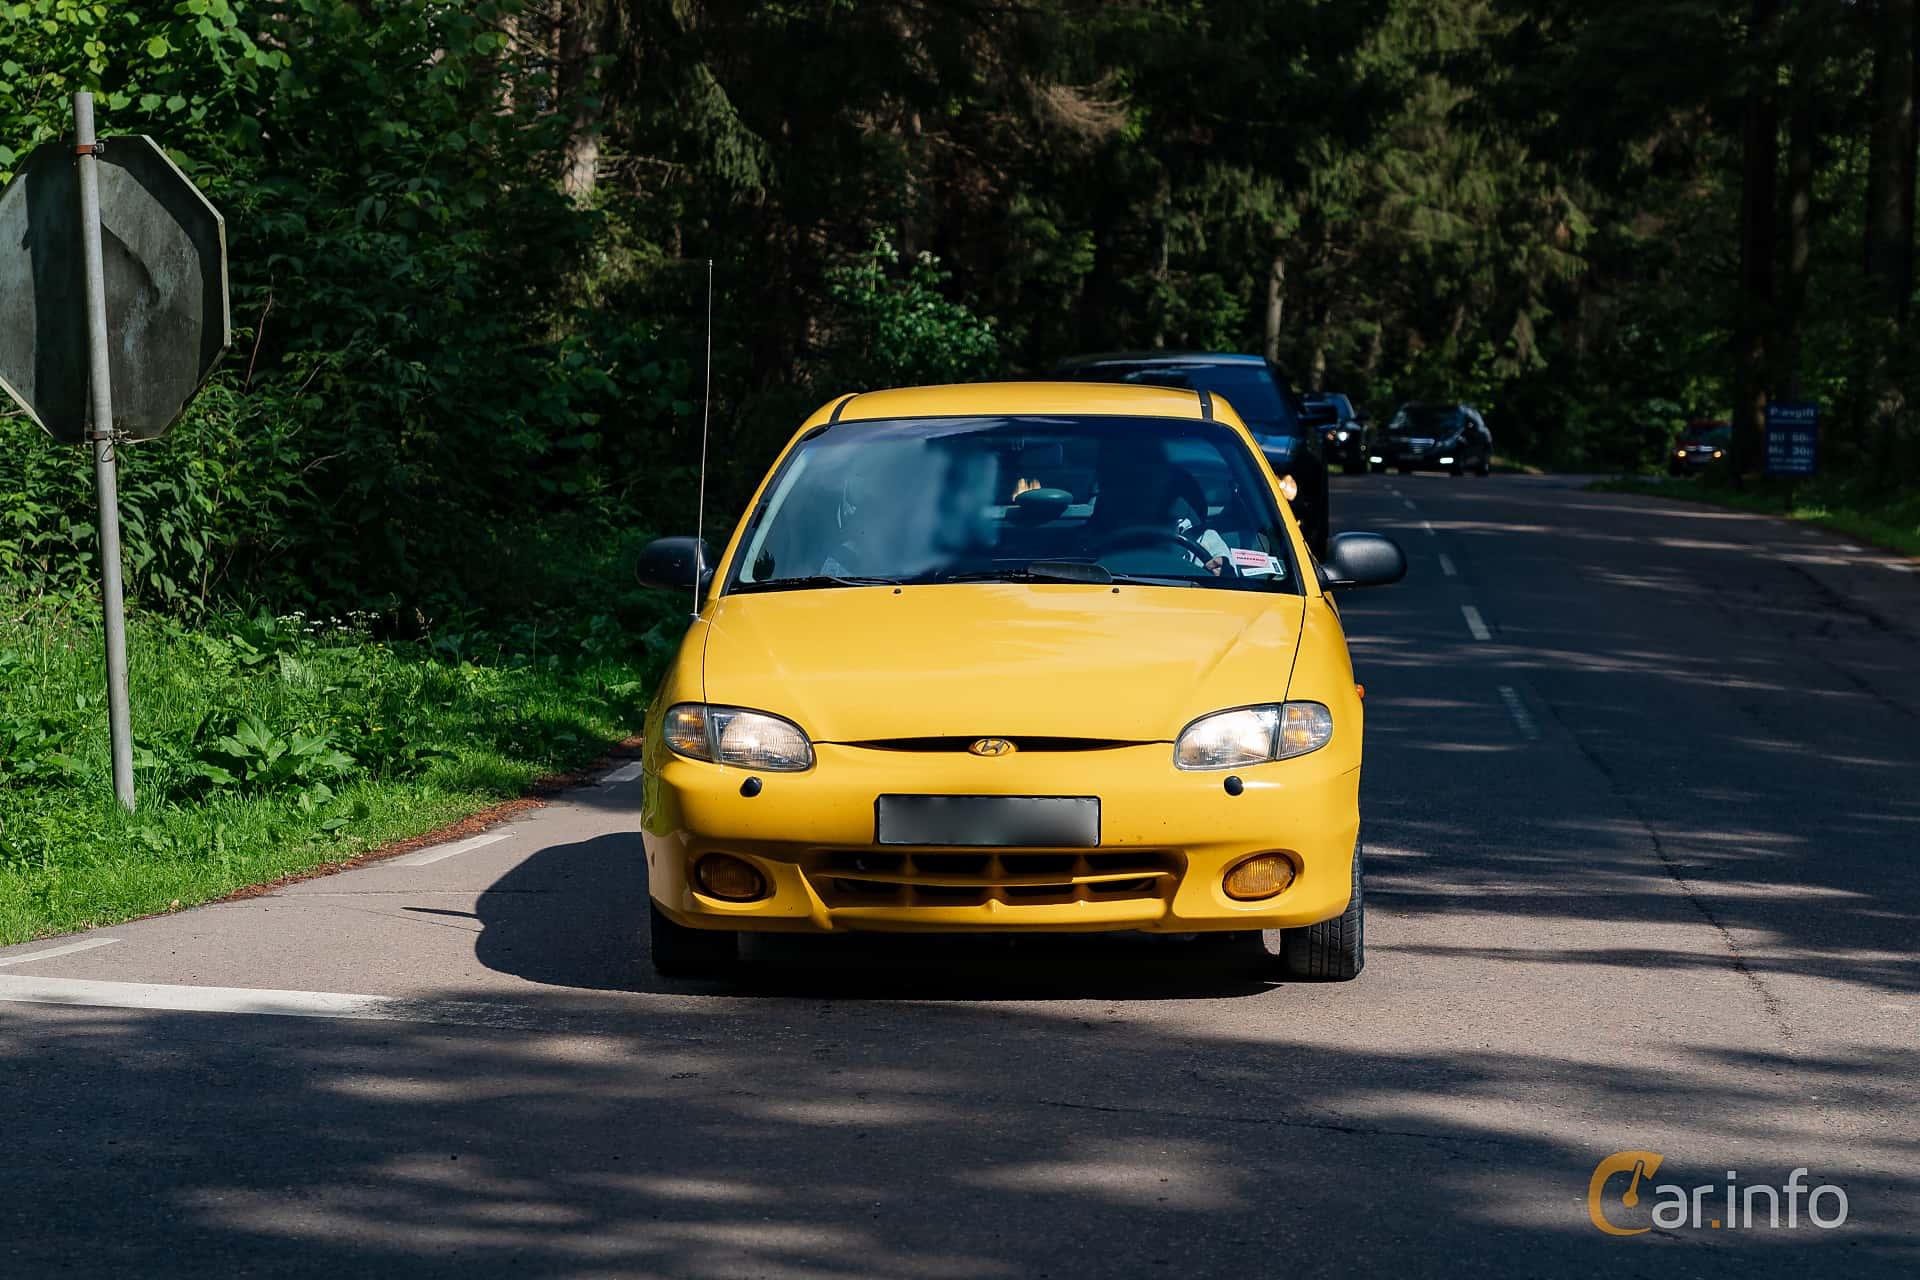 Hyundai Accent 5-door 1.5 Manual, 91hp, 1998 at Svenskt sportvagnsmeeting 2019